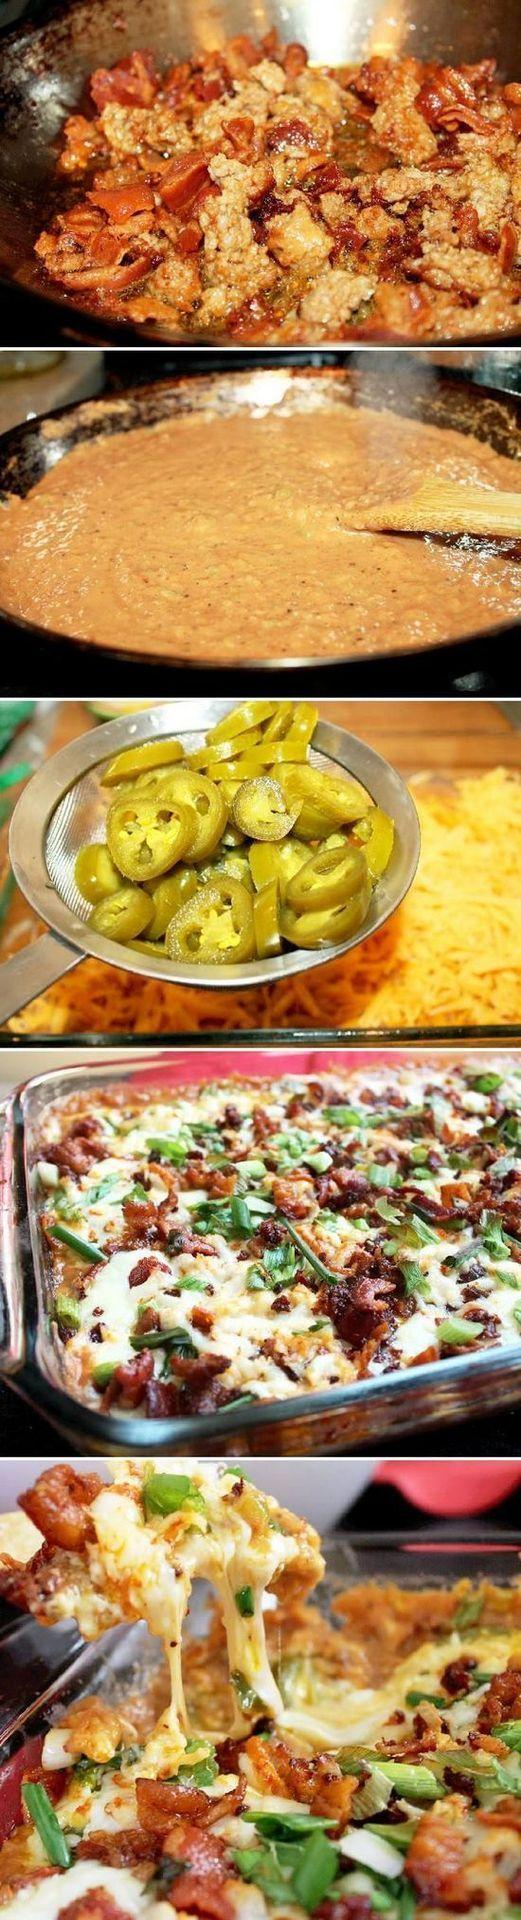 Hot 7 Layer Bean Dip | Recipes | Pinterest